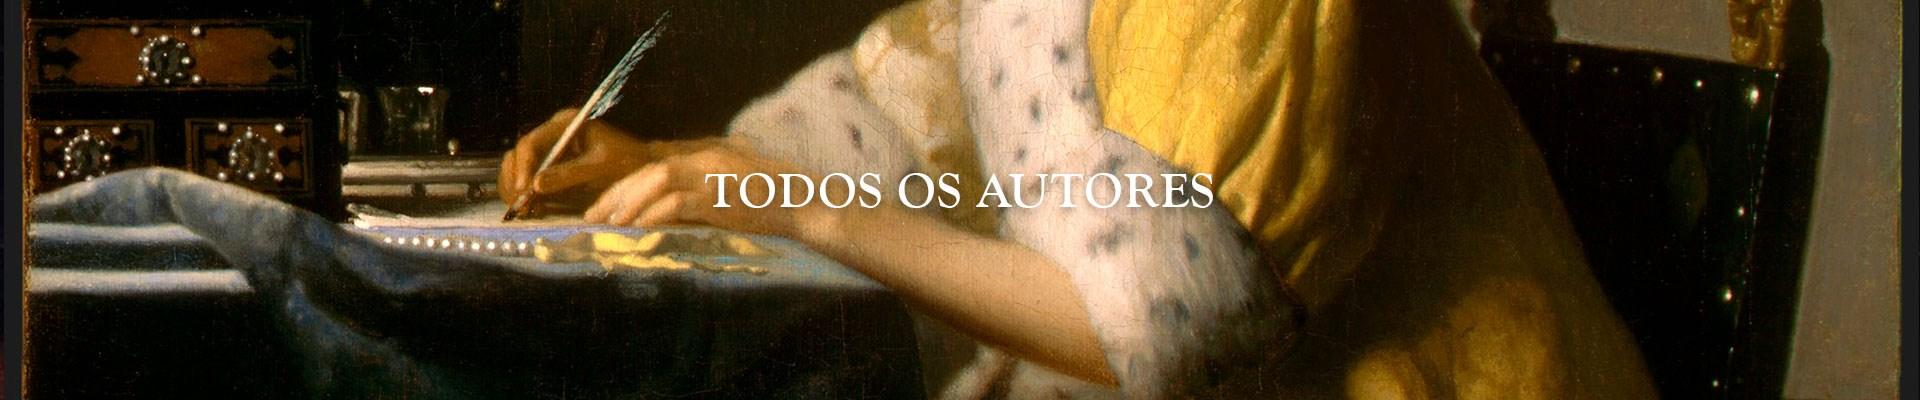 todos os autores